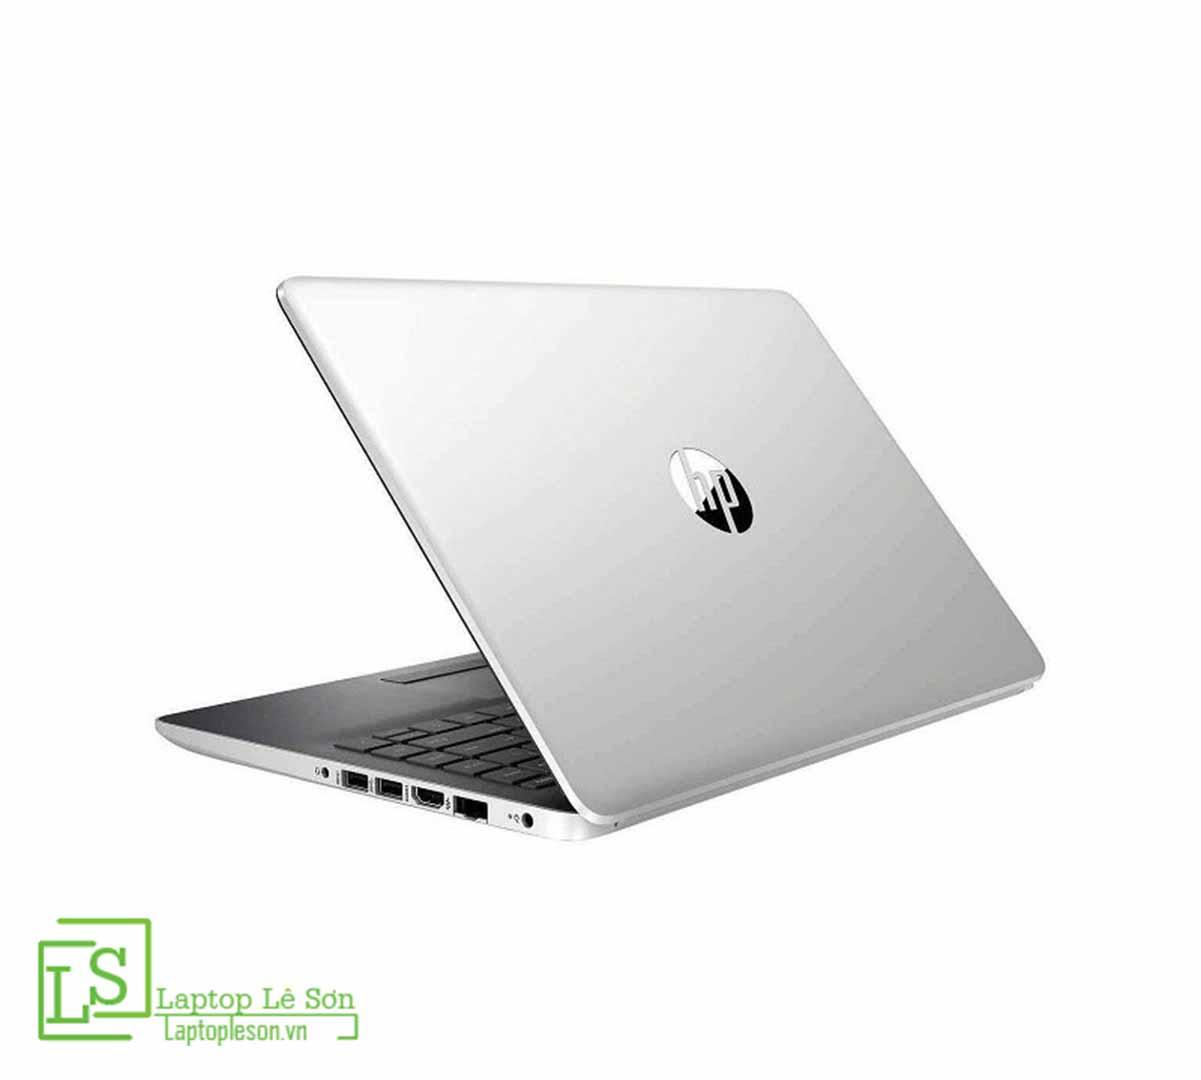 hp notebook 14-df0023cl laptop lê sơn 04